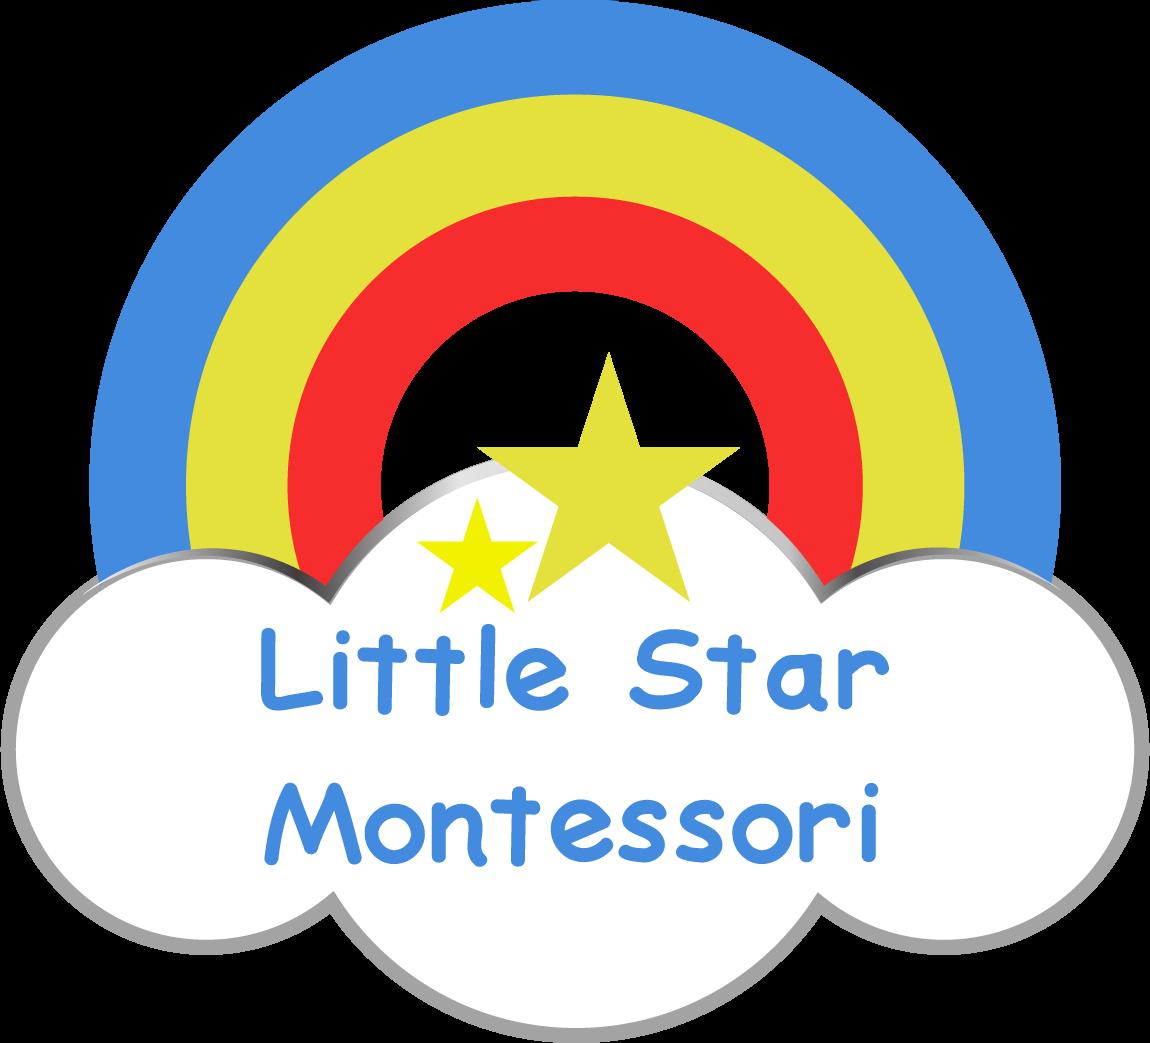 Little Star Montessori